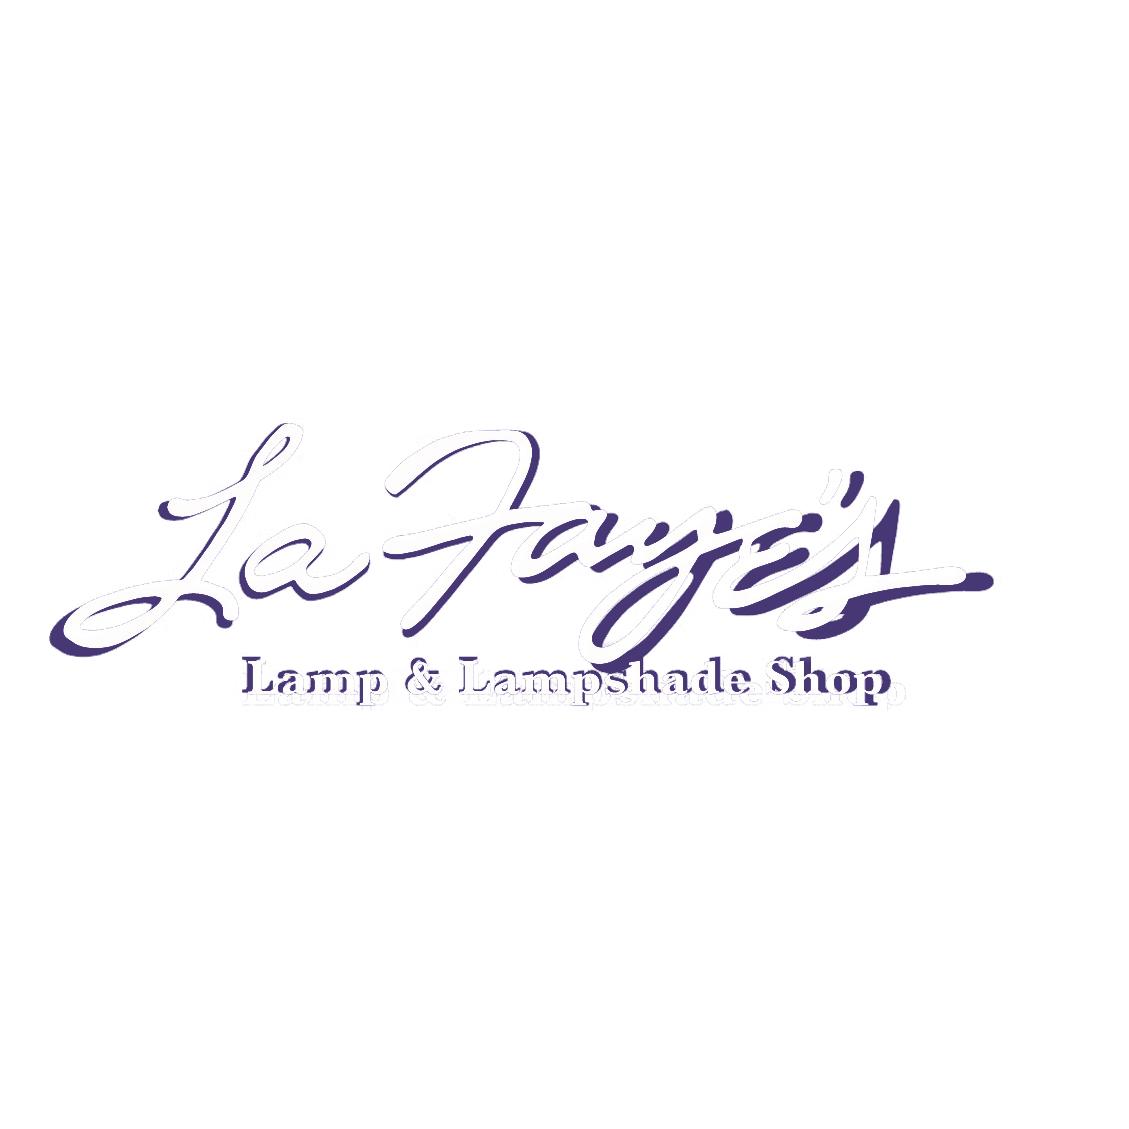 LaFaye's Lamp And Shade Shop